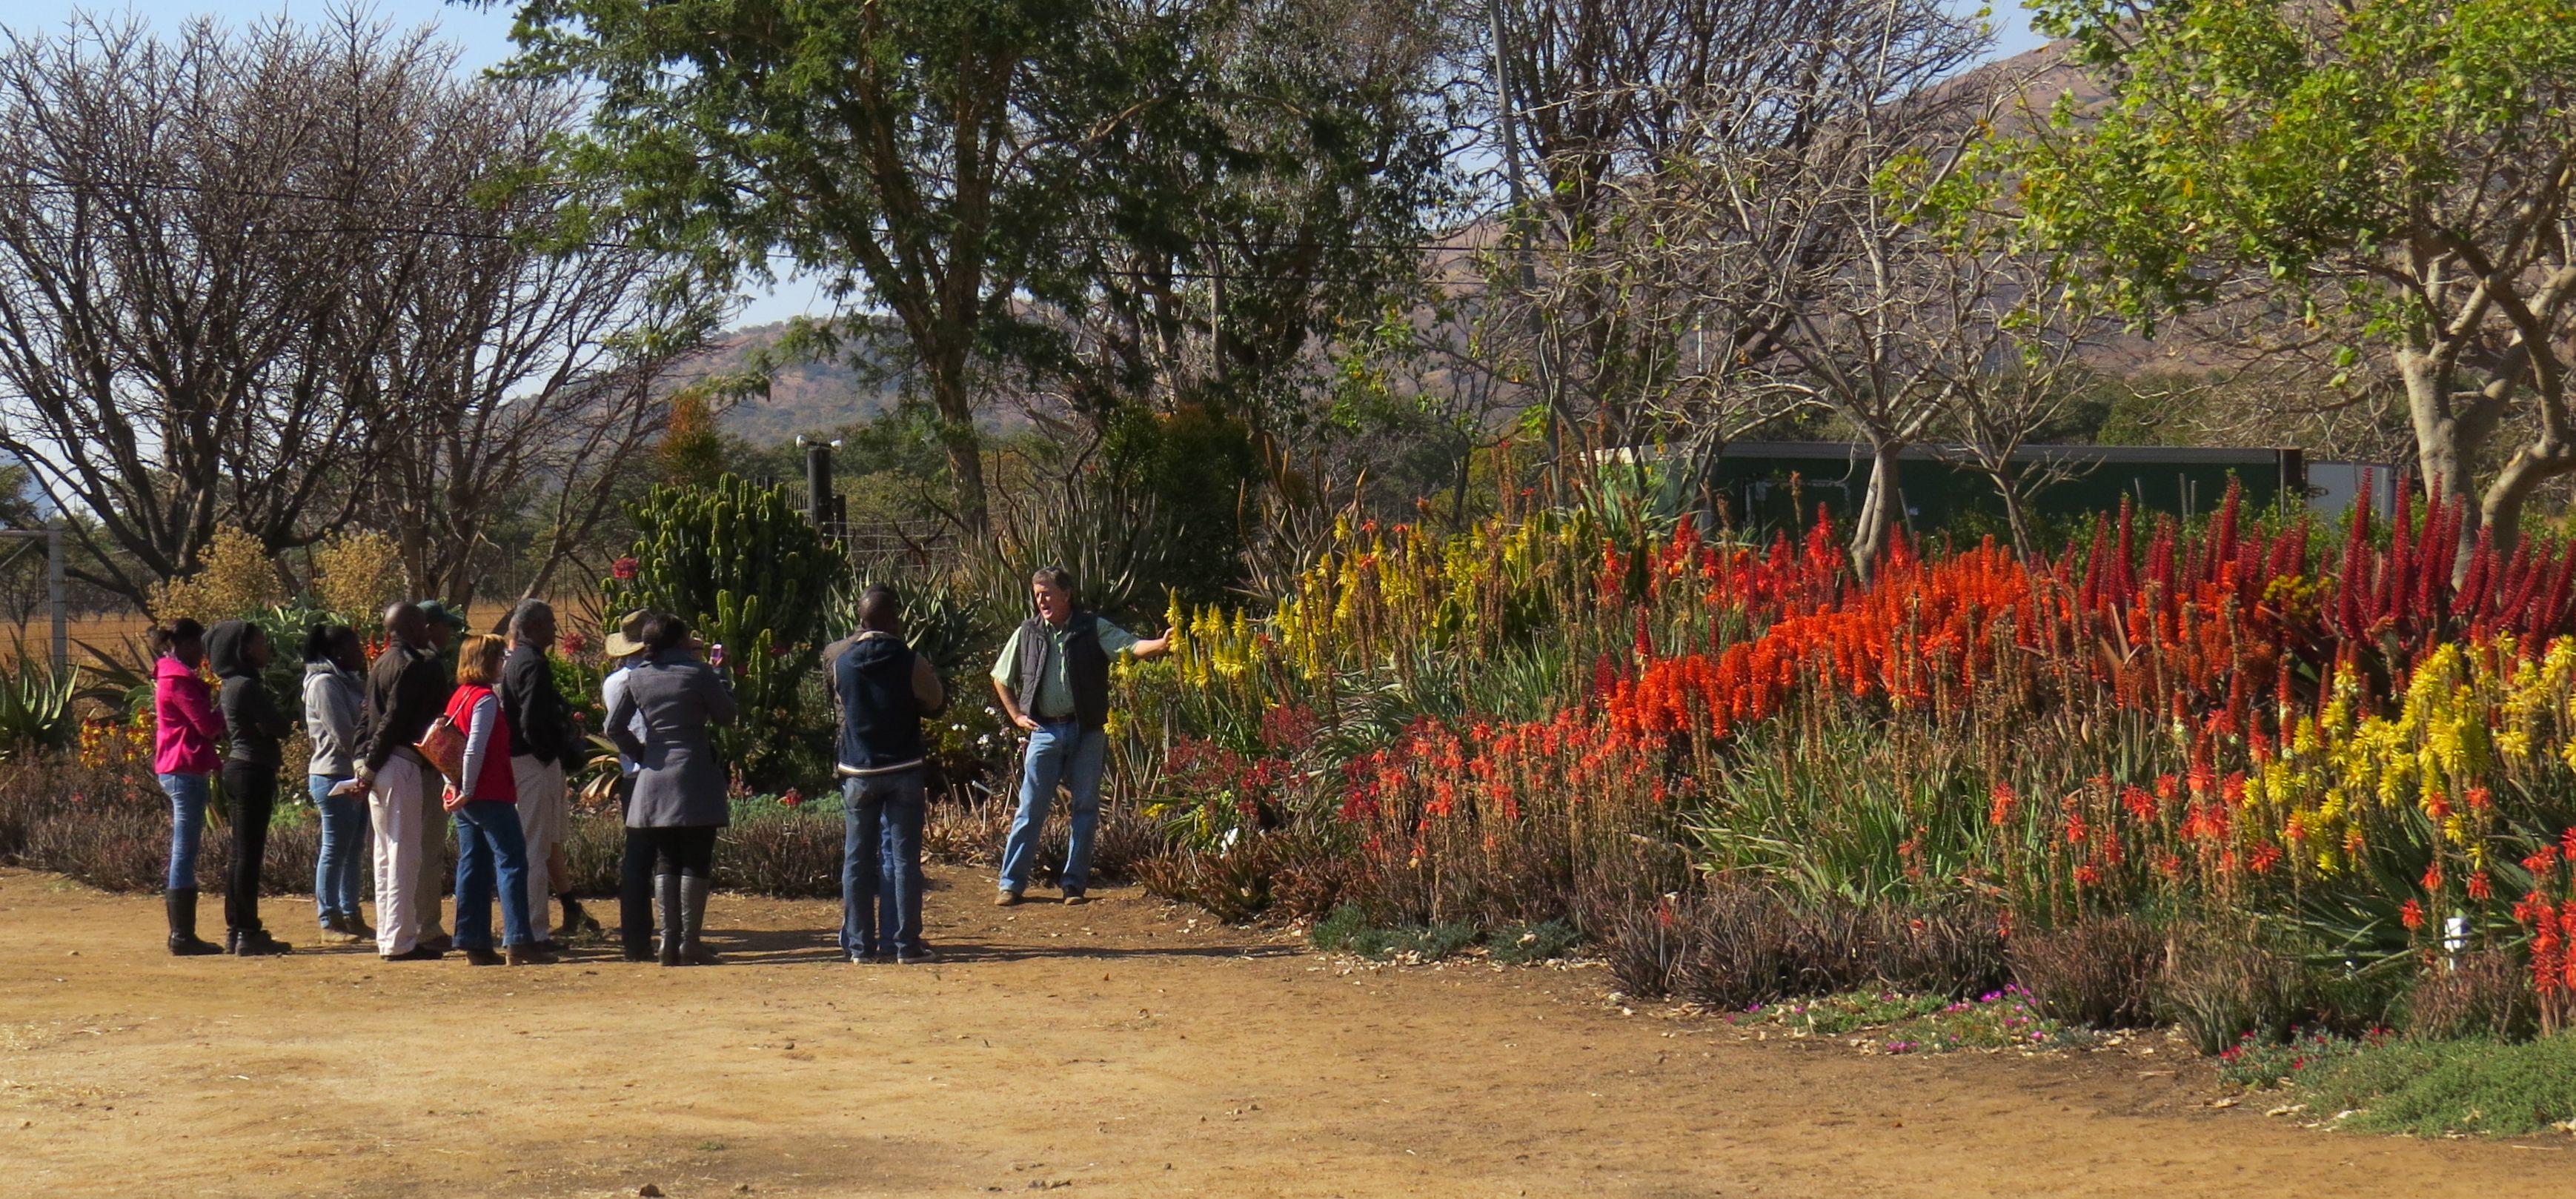 The ALOE FARM garden talk in winter.   THE ALOE FARM   Pinterest ...